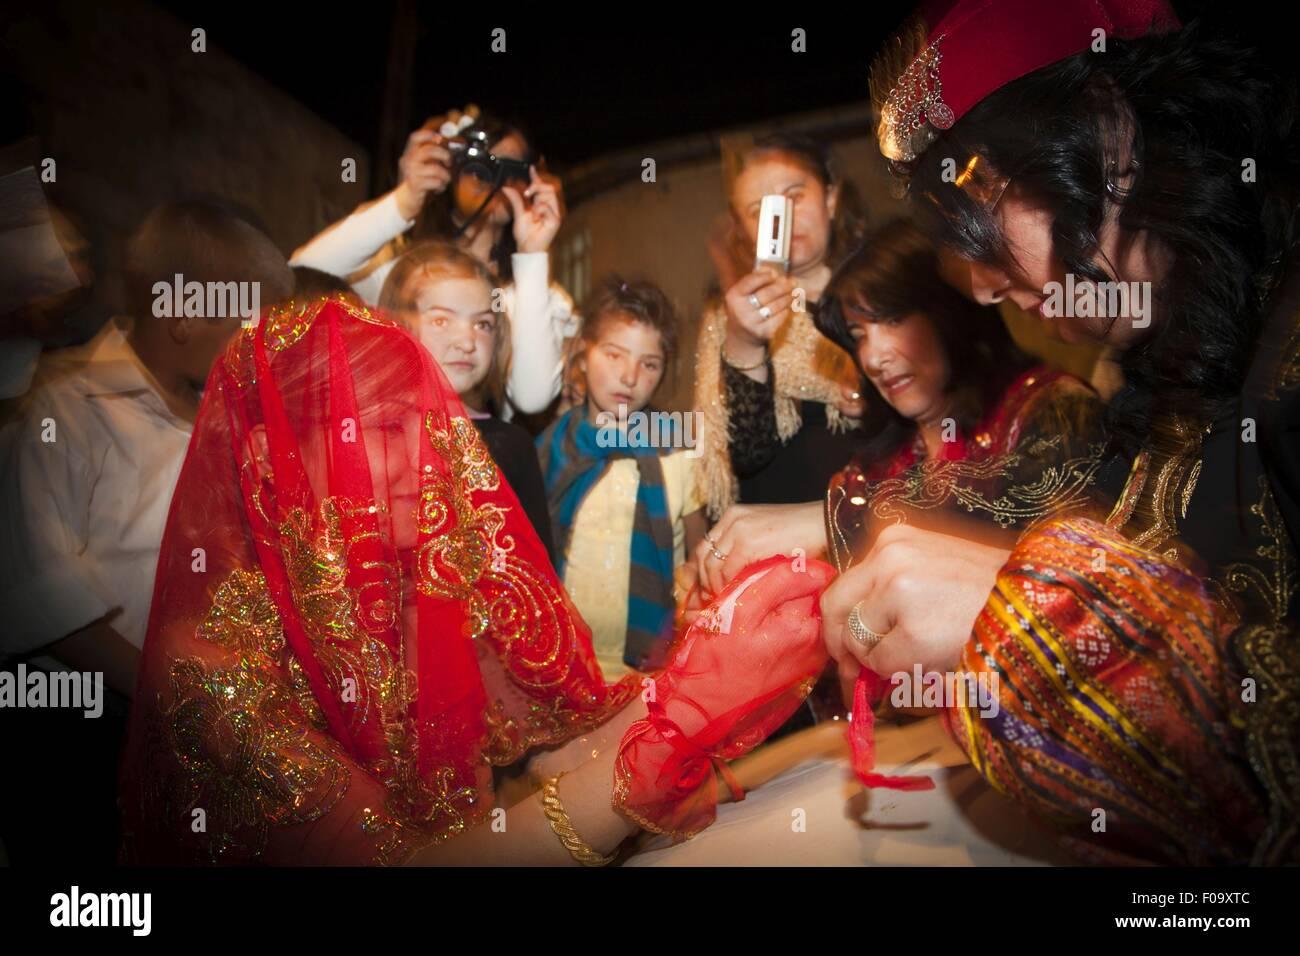 Henna Night Stock Photos Henna Night Stock Images Alamy